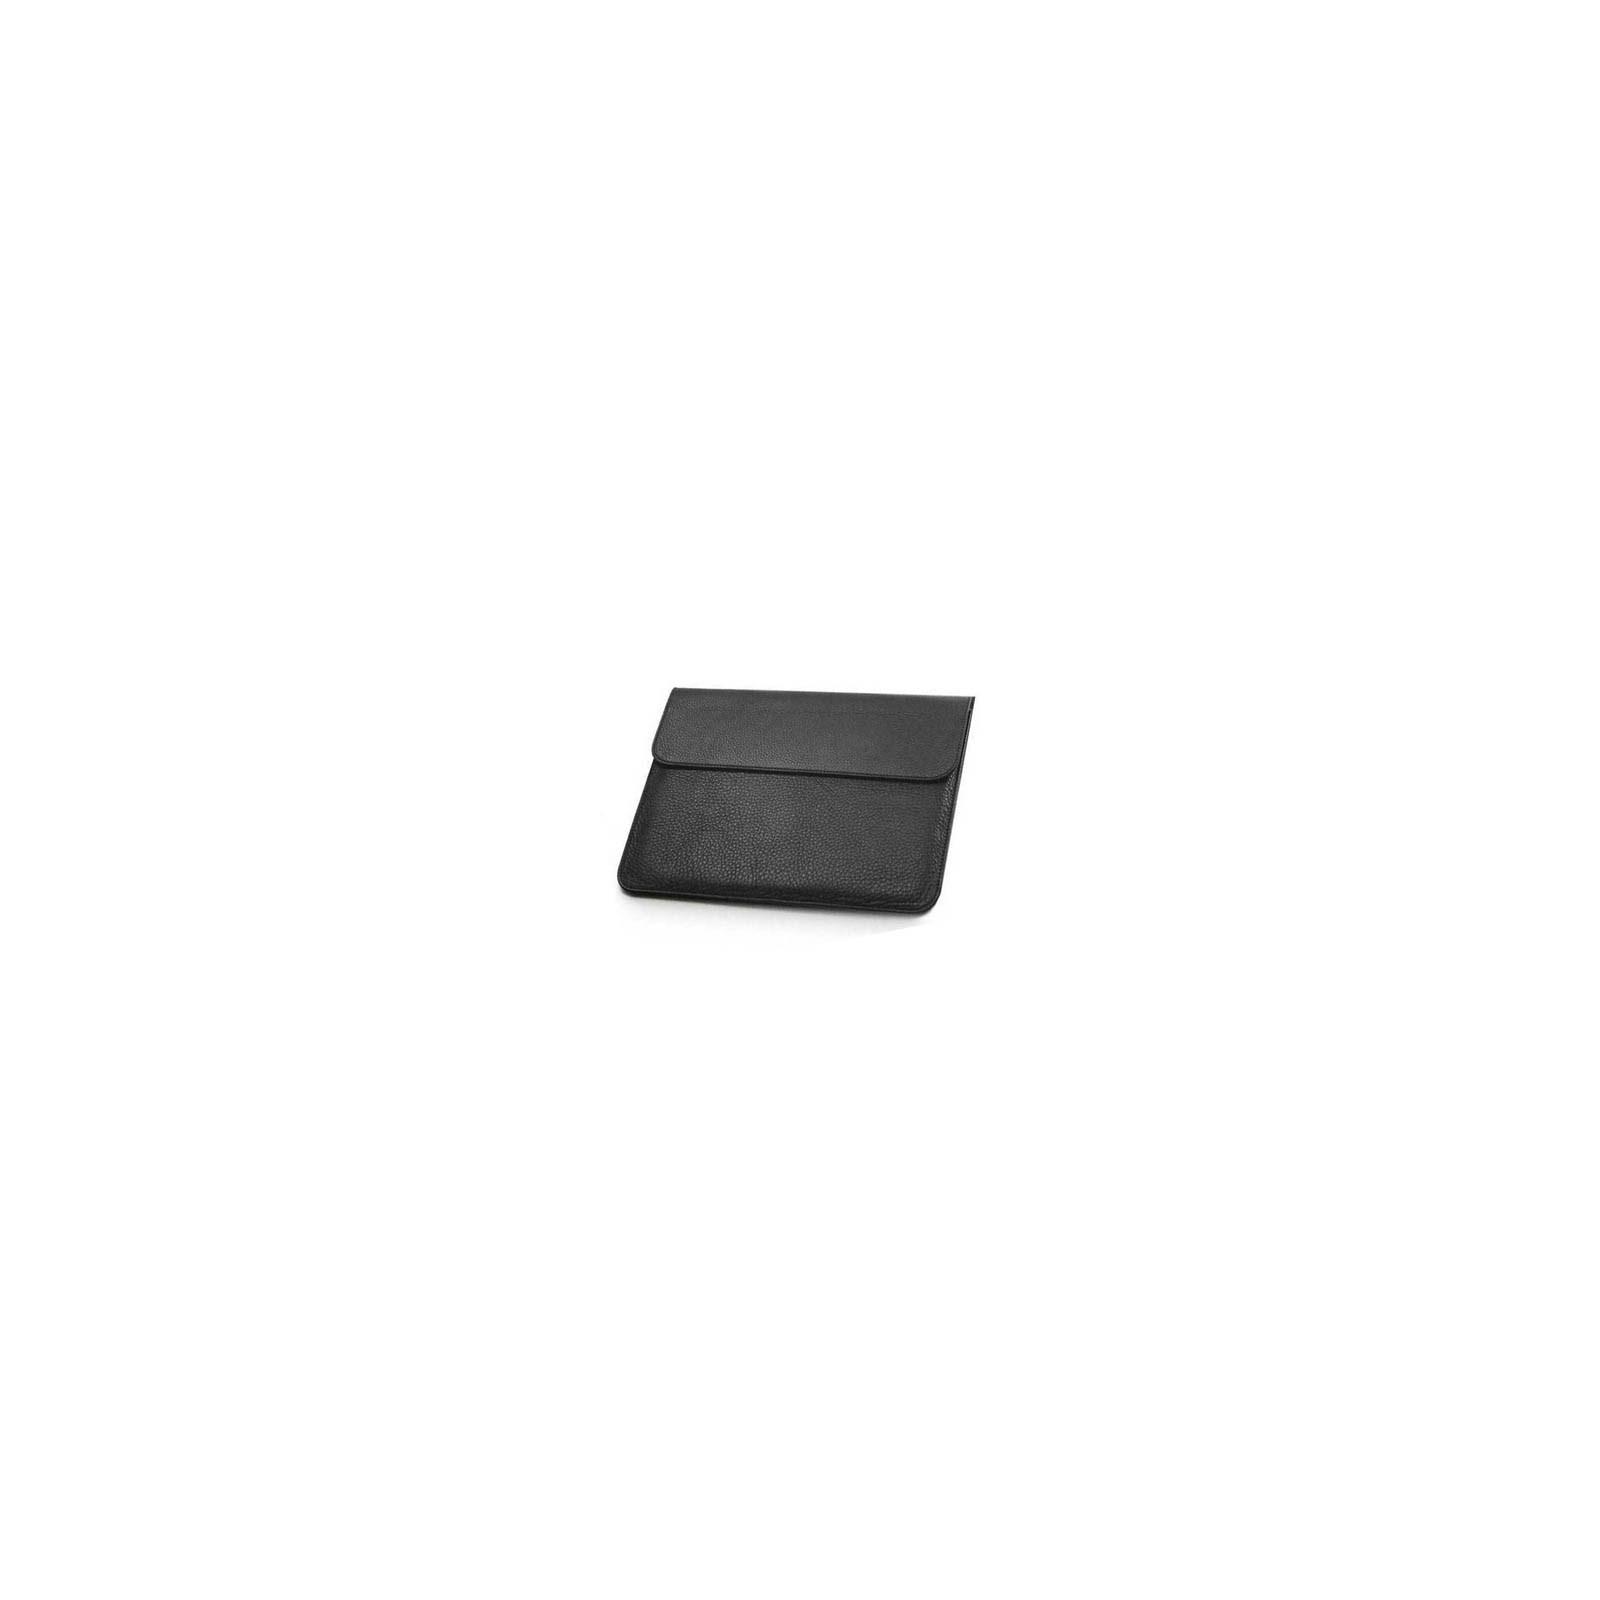 Чехол для планшета SB iPad Soft case (black) (324012)